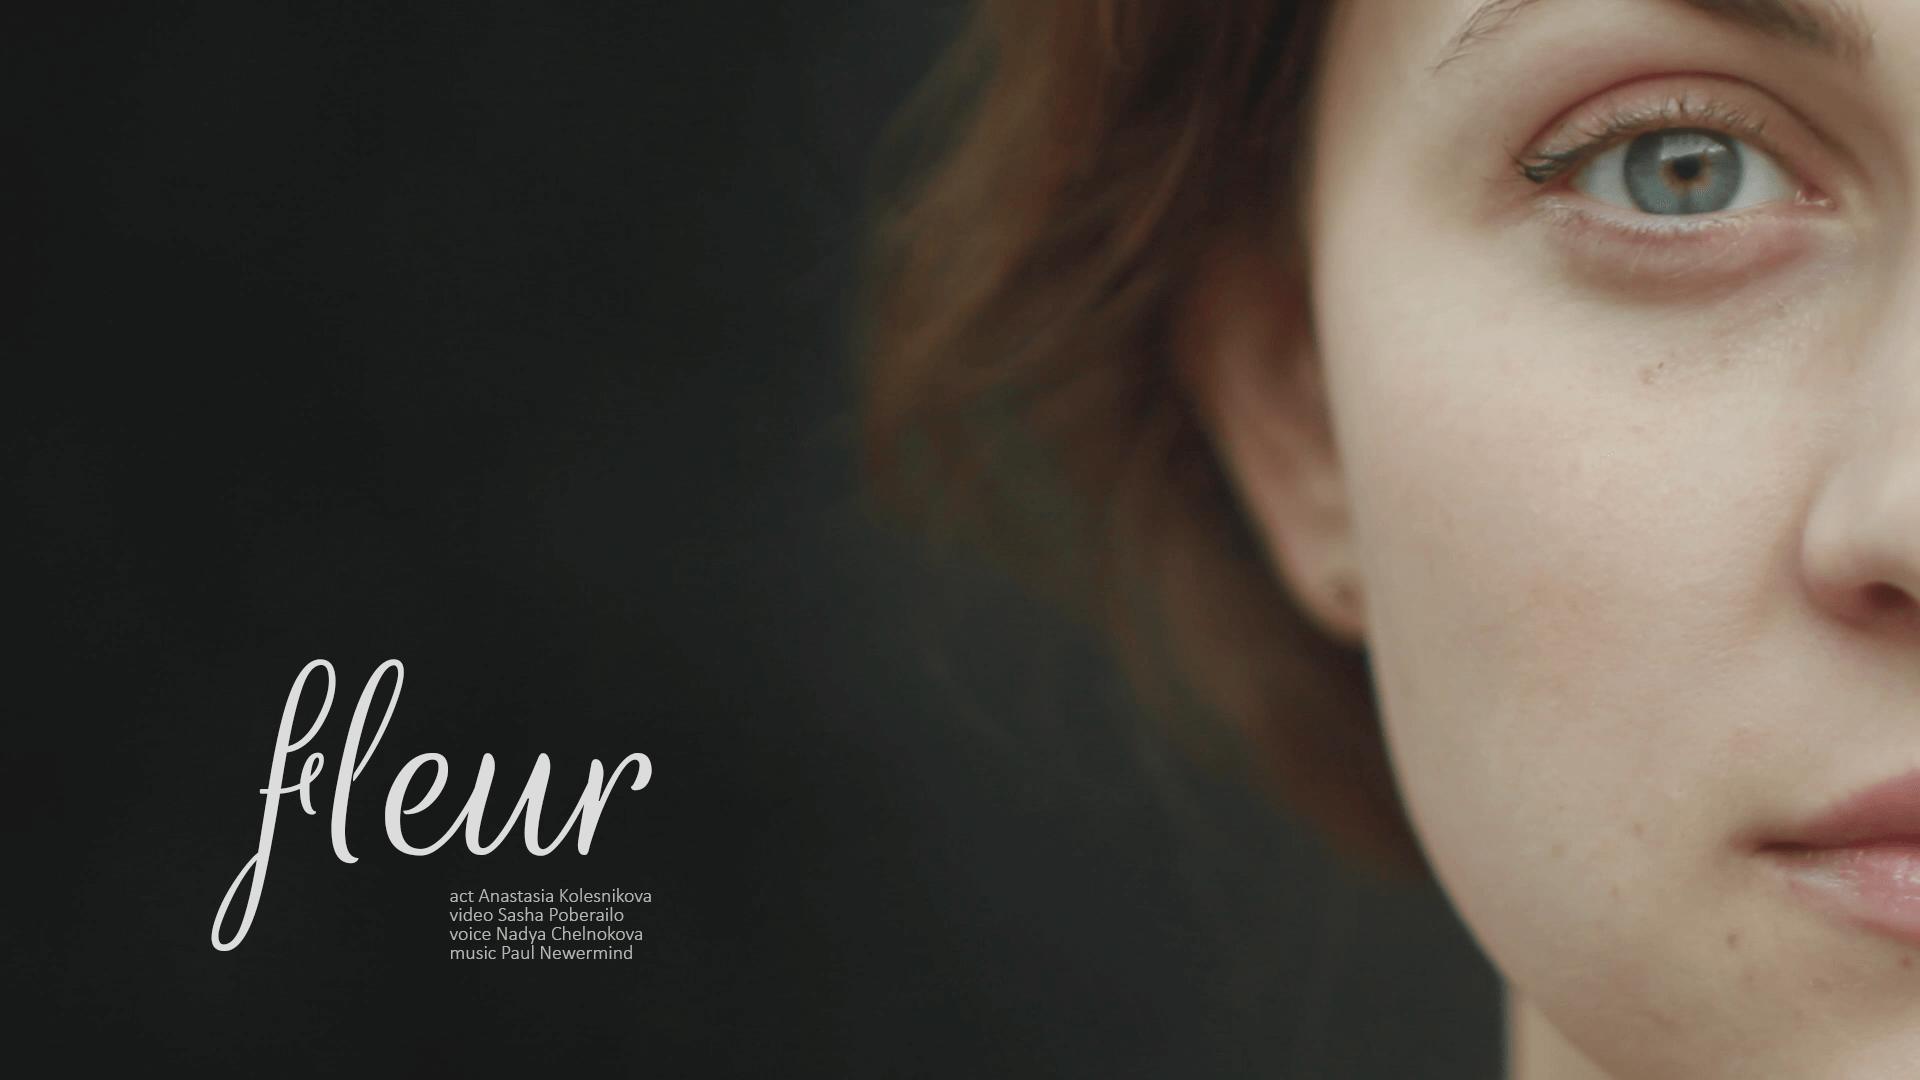 fleur short fashion film - actress, fashion, french, mood, music